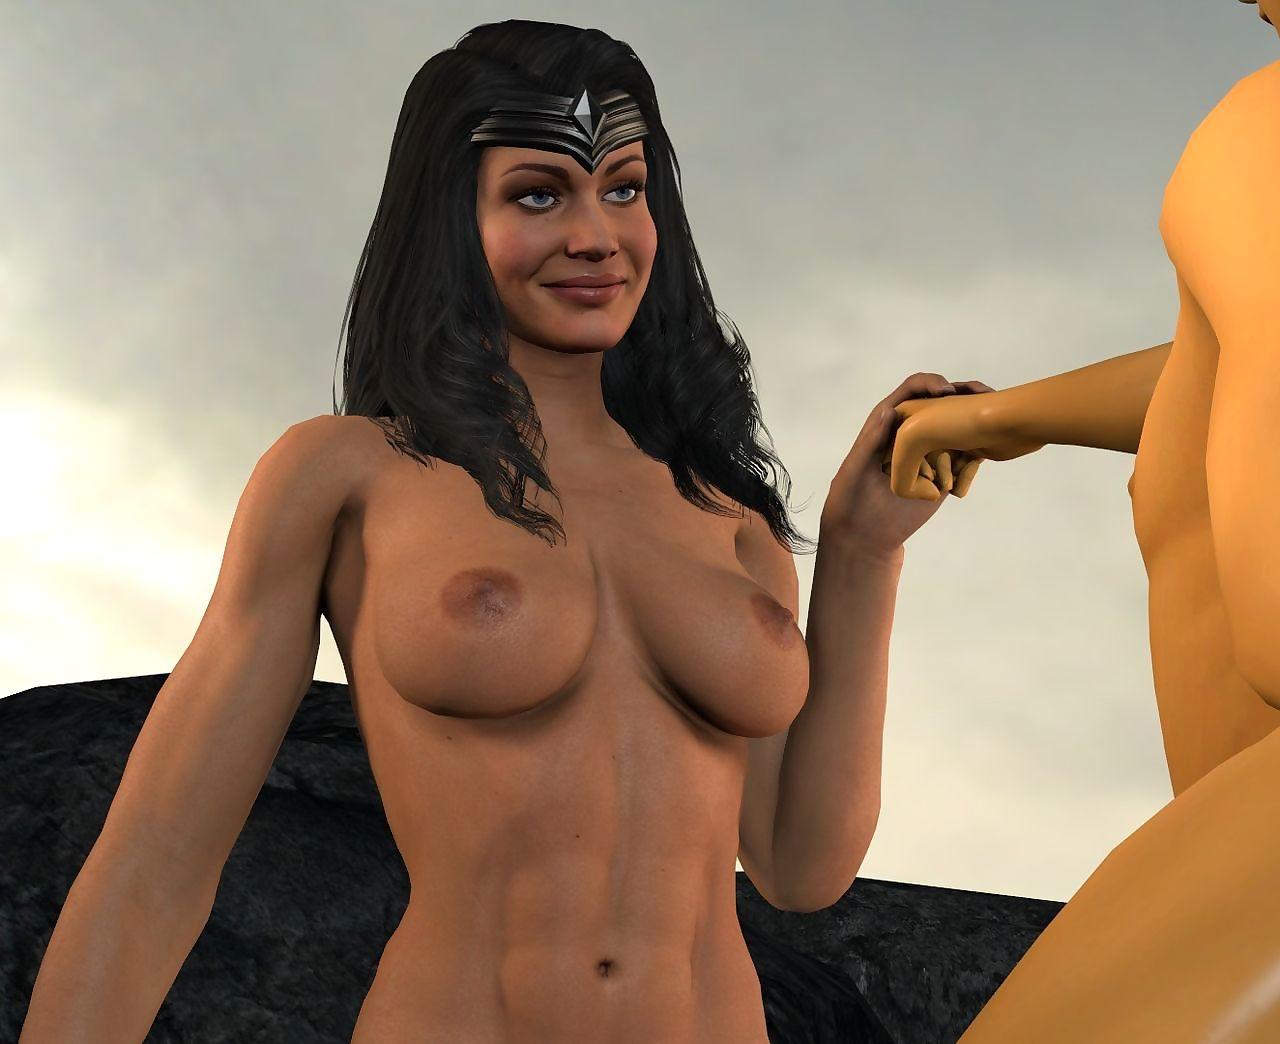 Diana Bruce BMWW WonderBat - Injustice/Injustice2/Arkham/DC - affixing 5